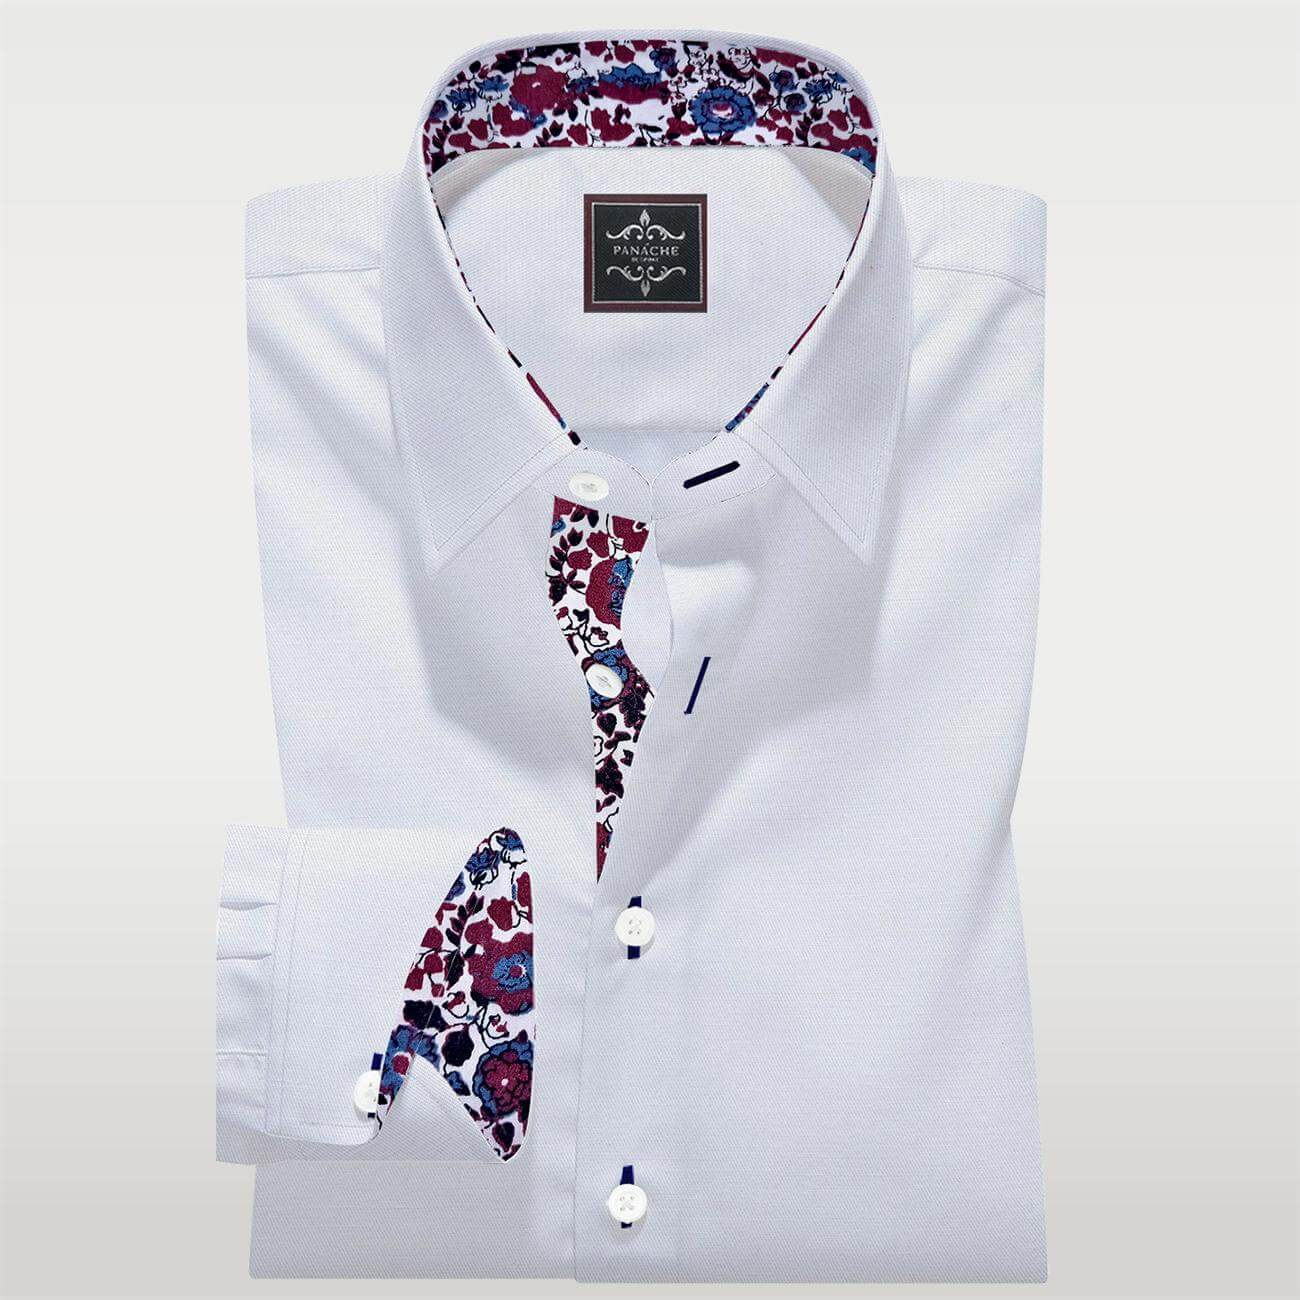 Luxury White Tailor Made Shirt